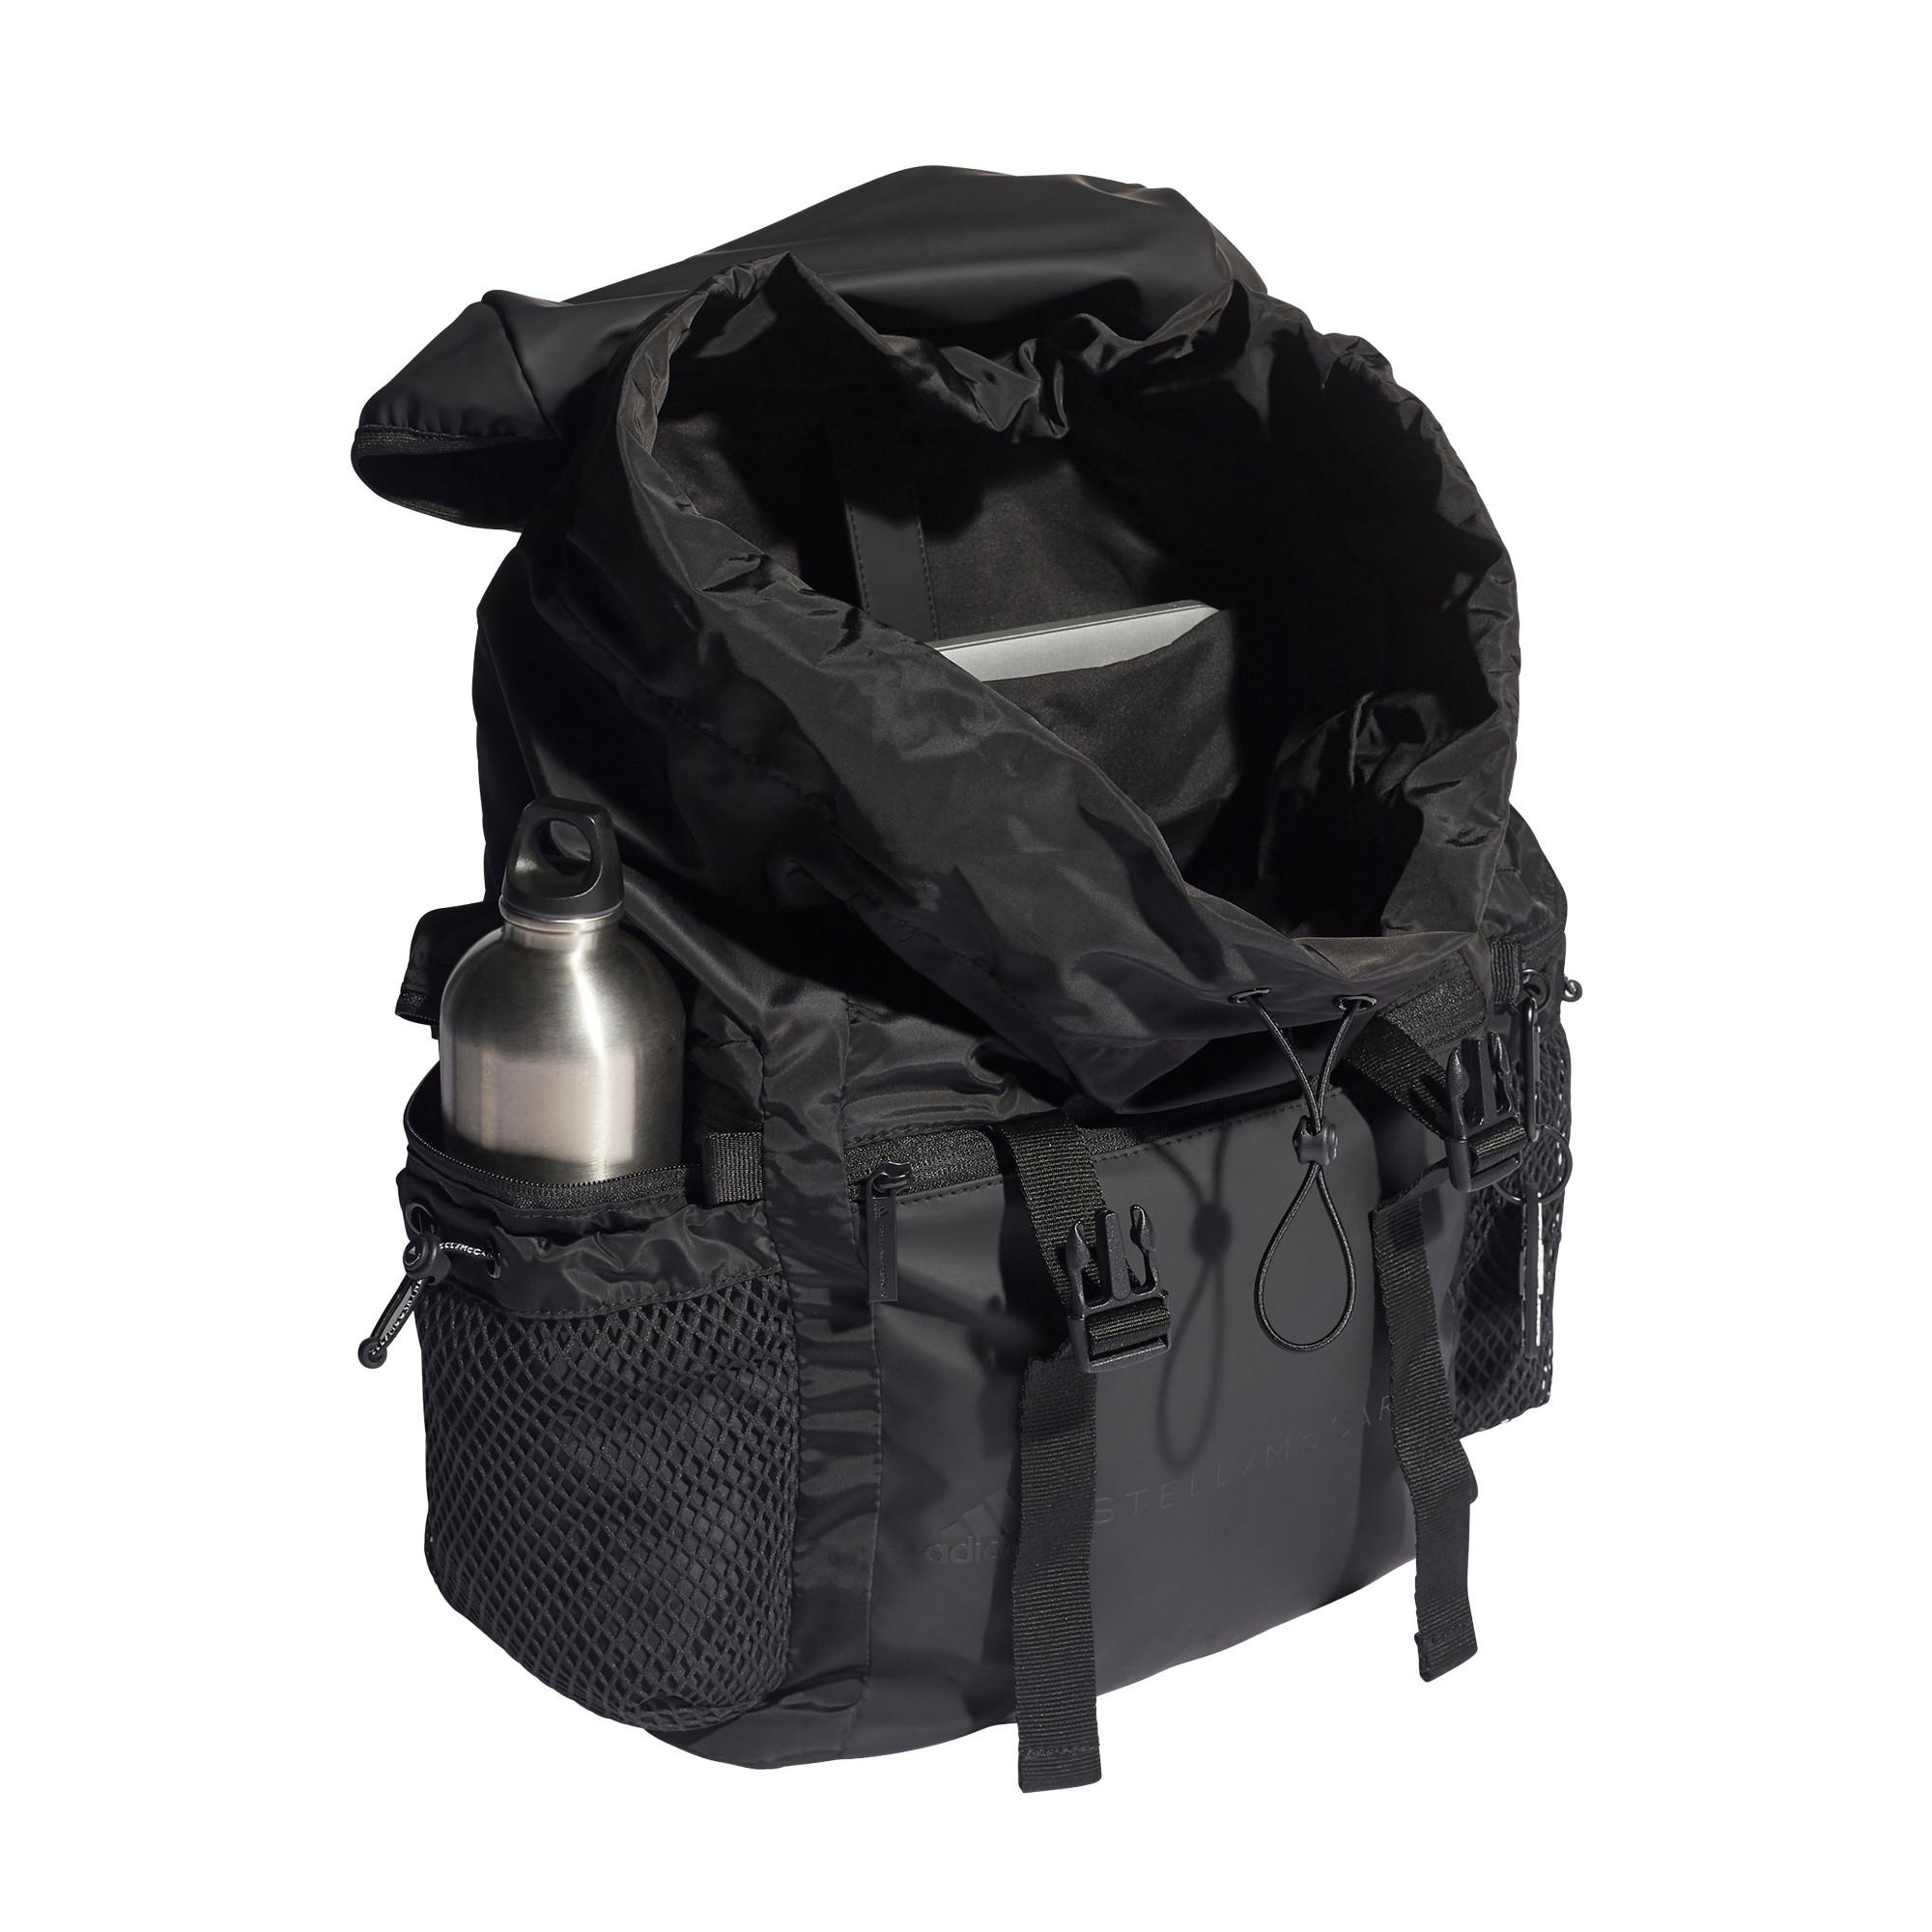 Zaino Asmc Backpack, Nero, large image number 1